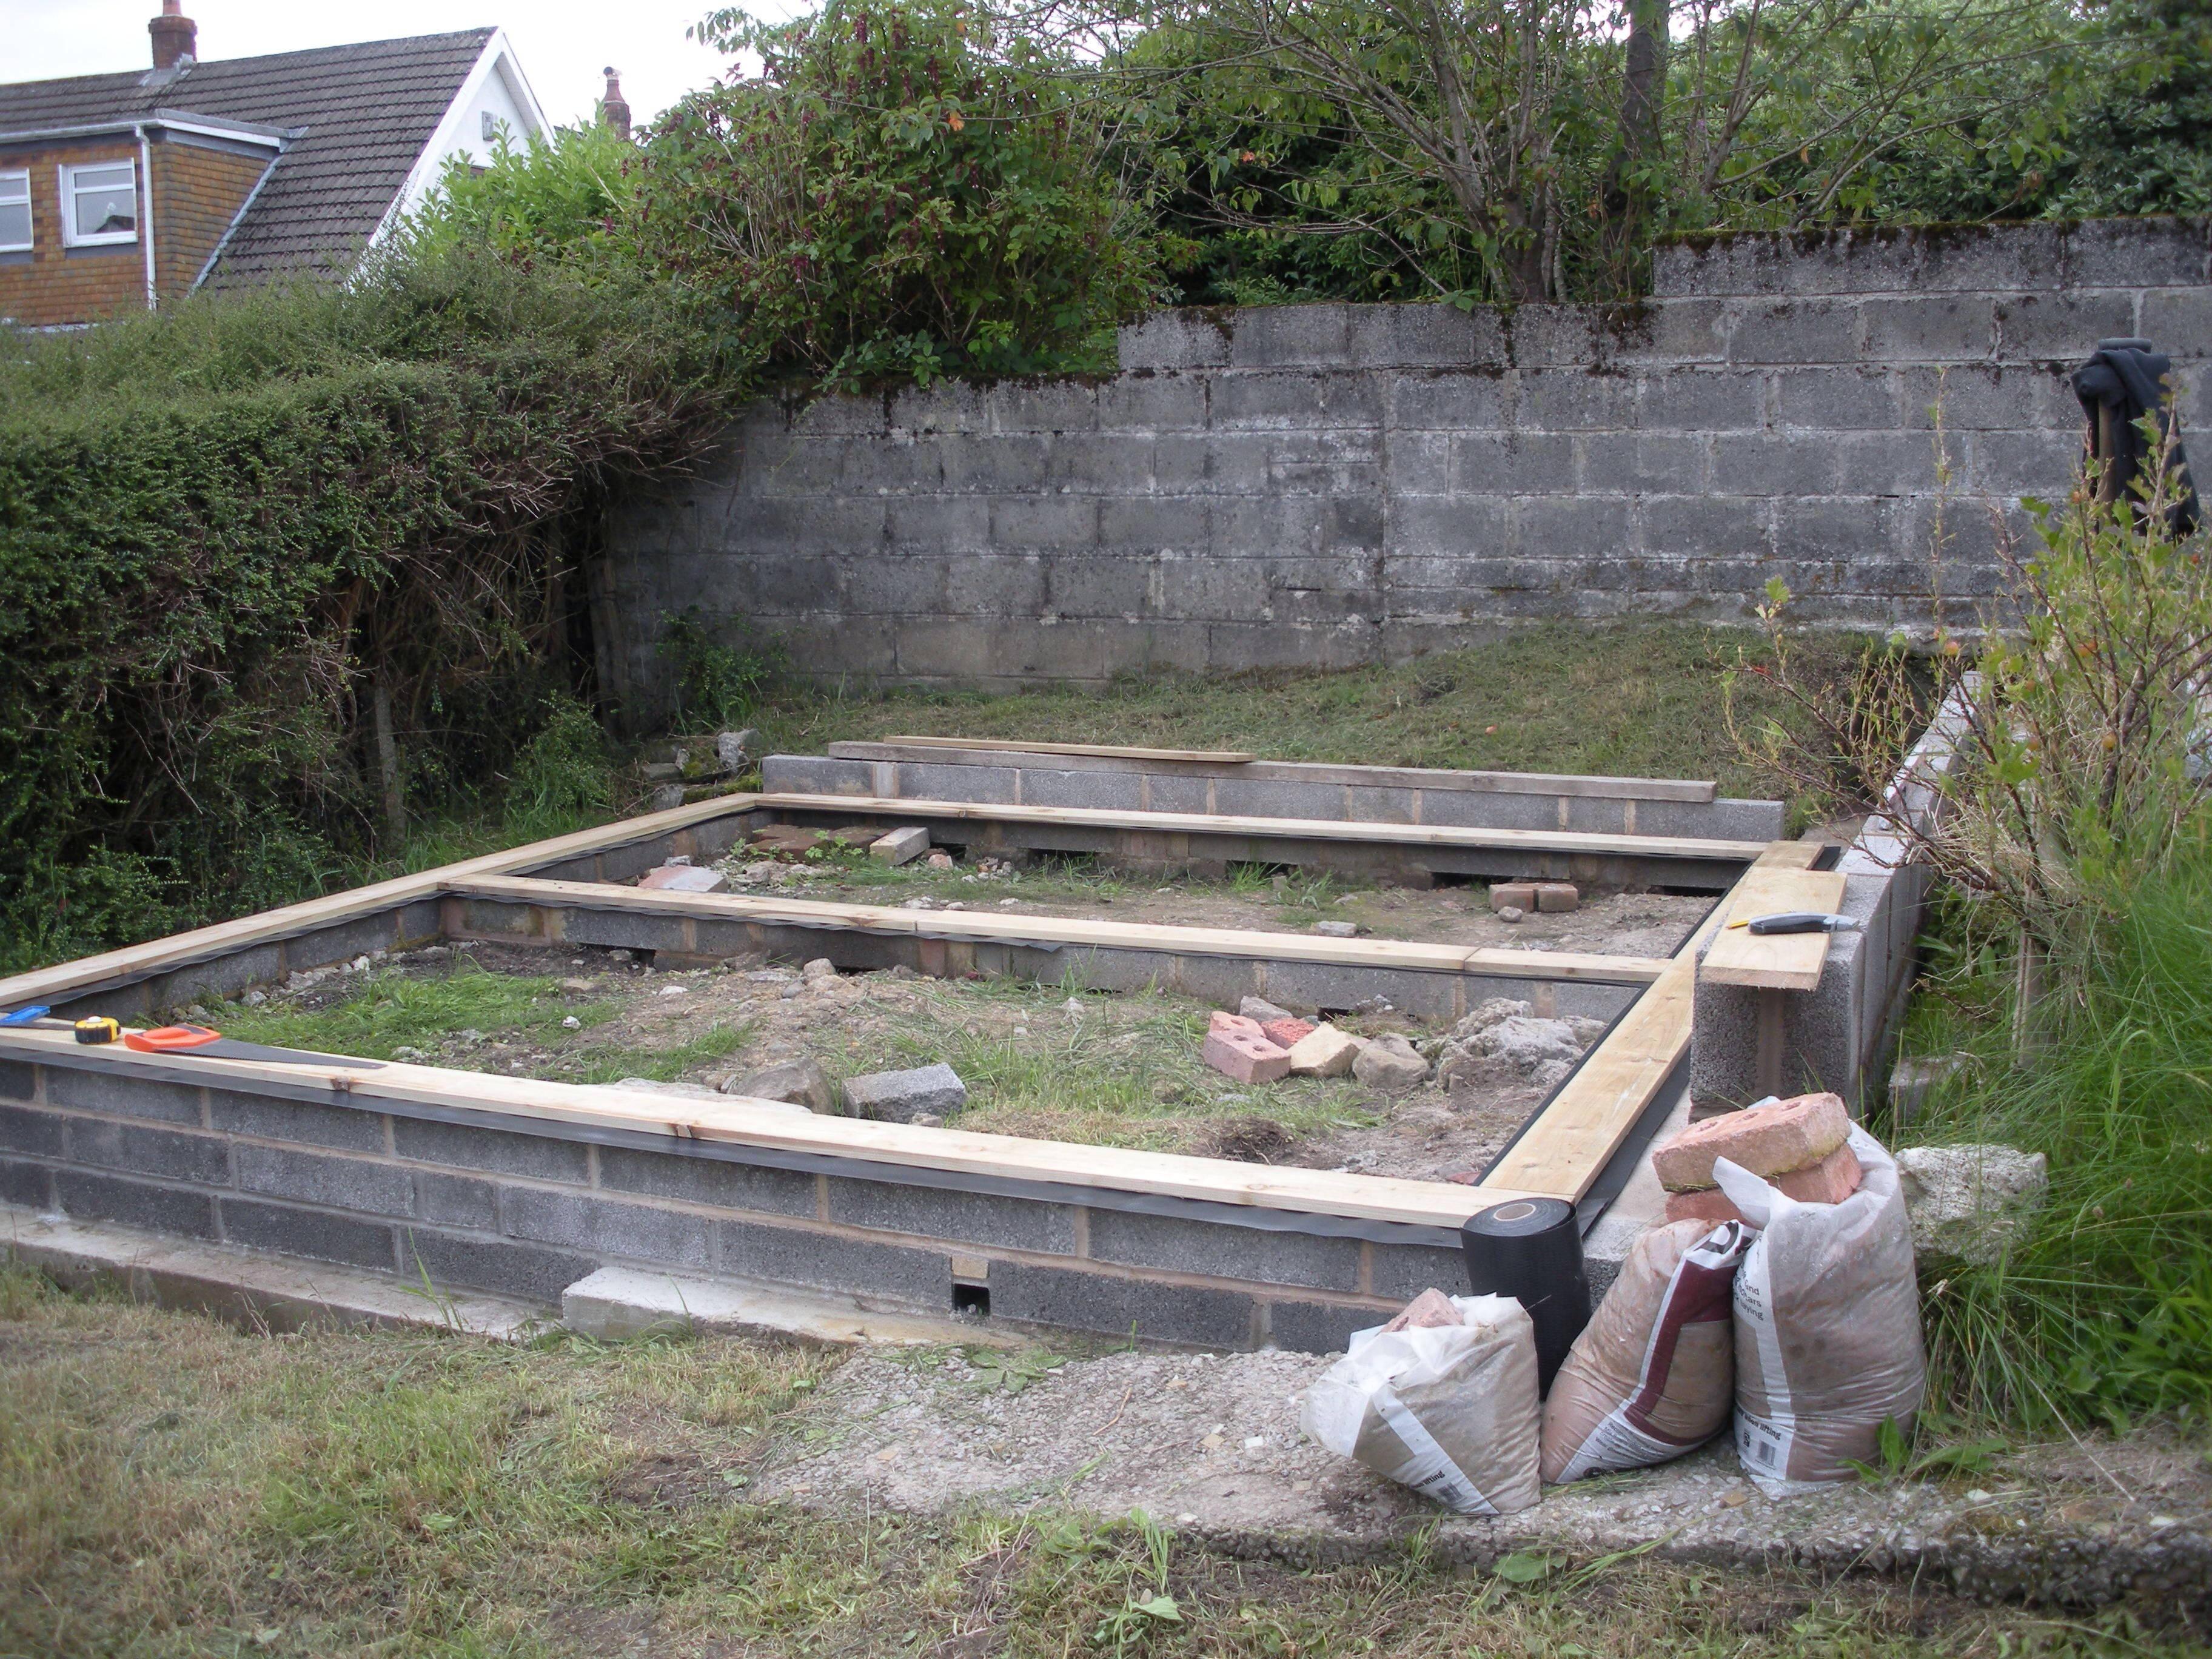 12x12 shed base - uneven ground | Shed plans, Backyard ... on Unlevel Backyard Ideas id=69024